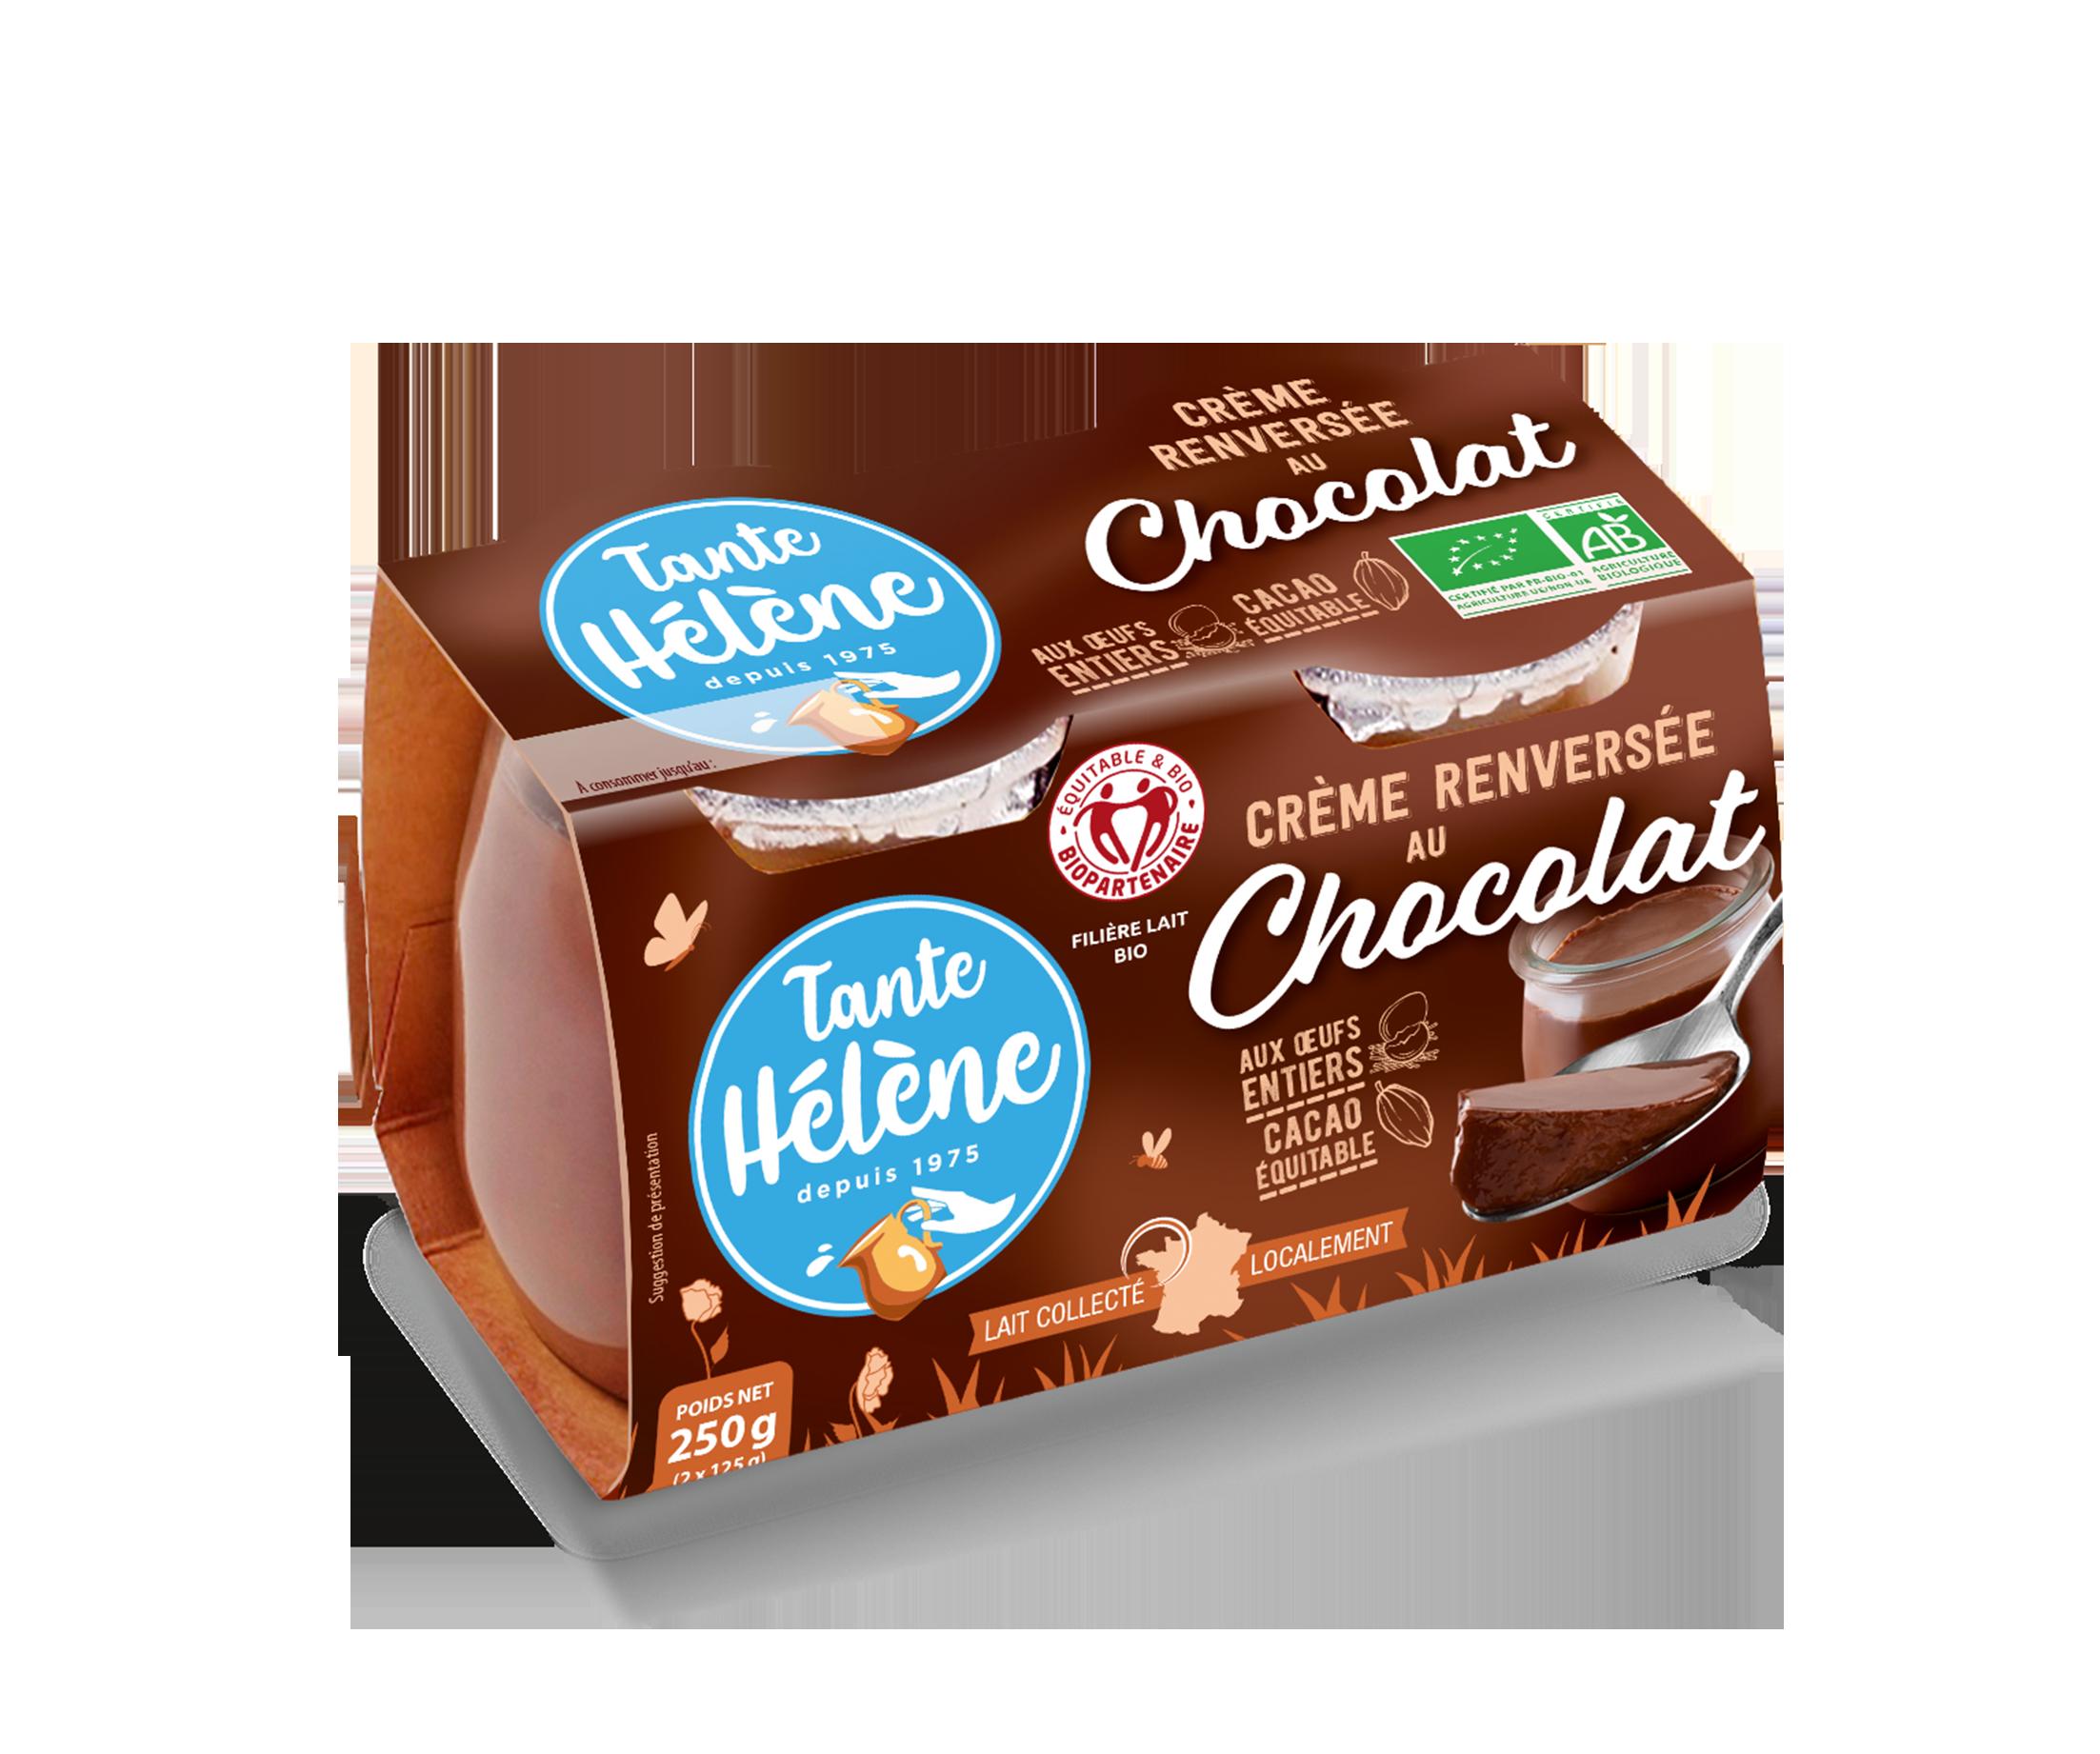 Cremerenversee Choco Tante Hélène